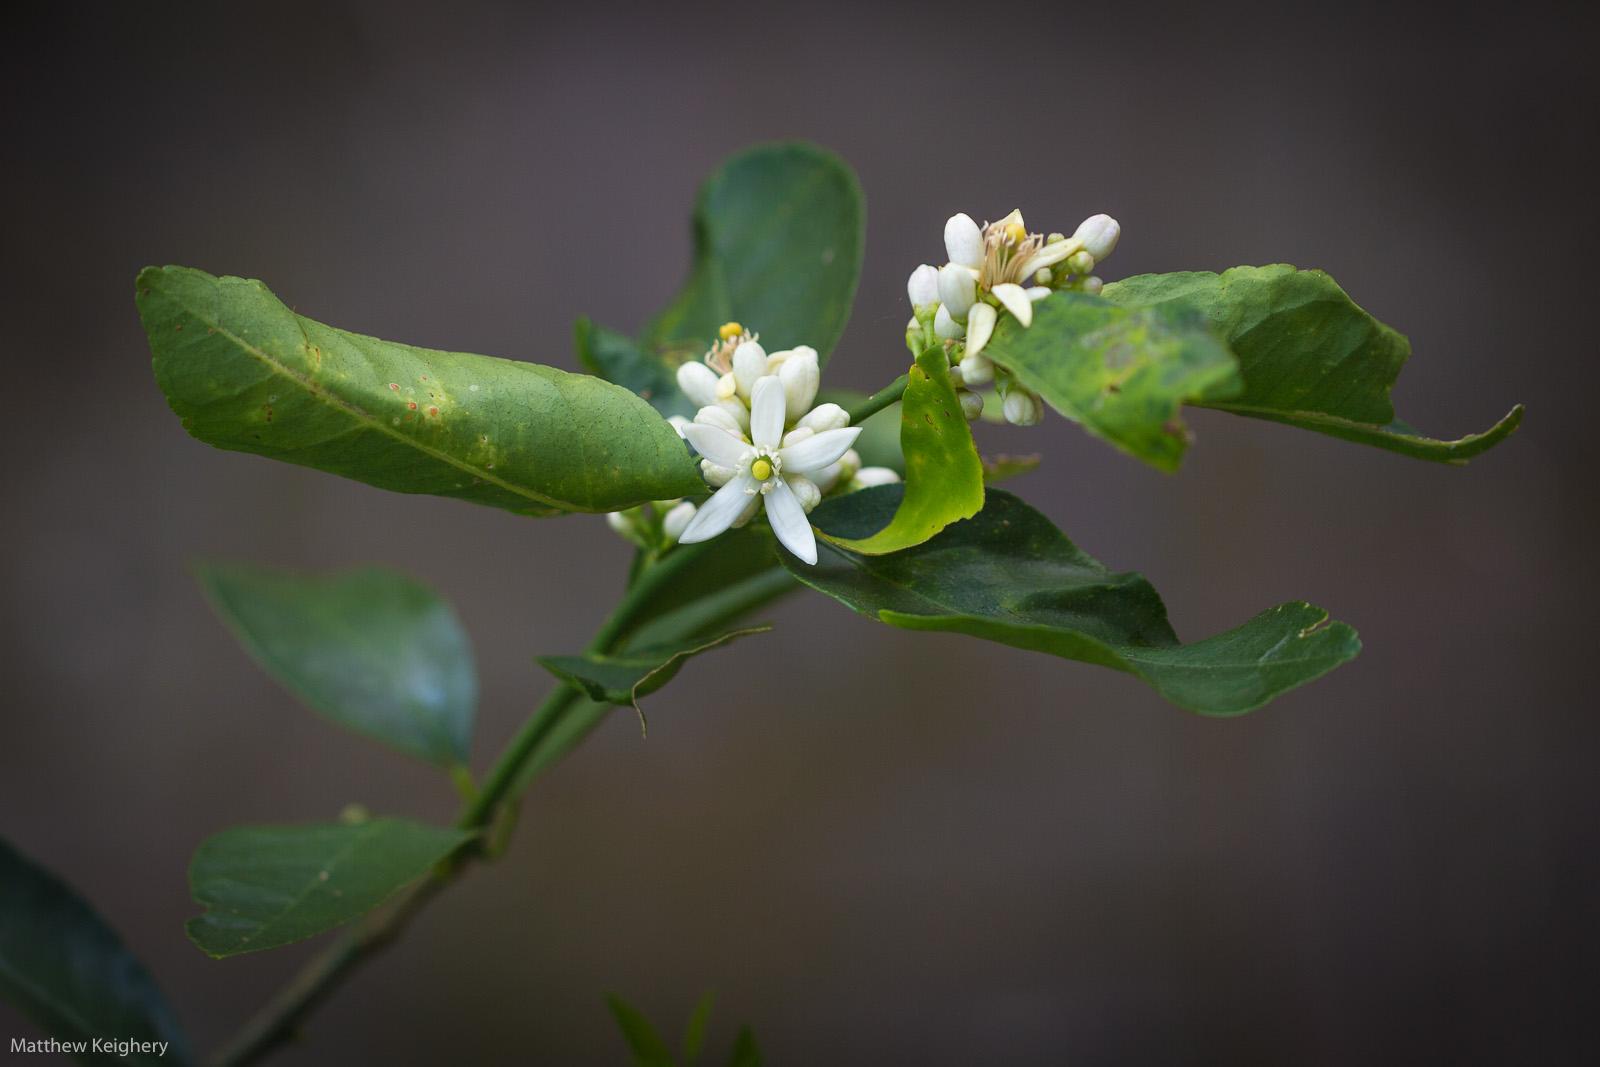 Limes, Citrus aurantifolia